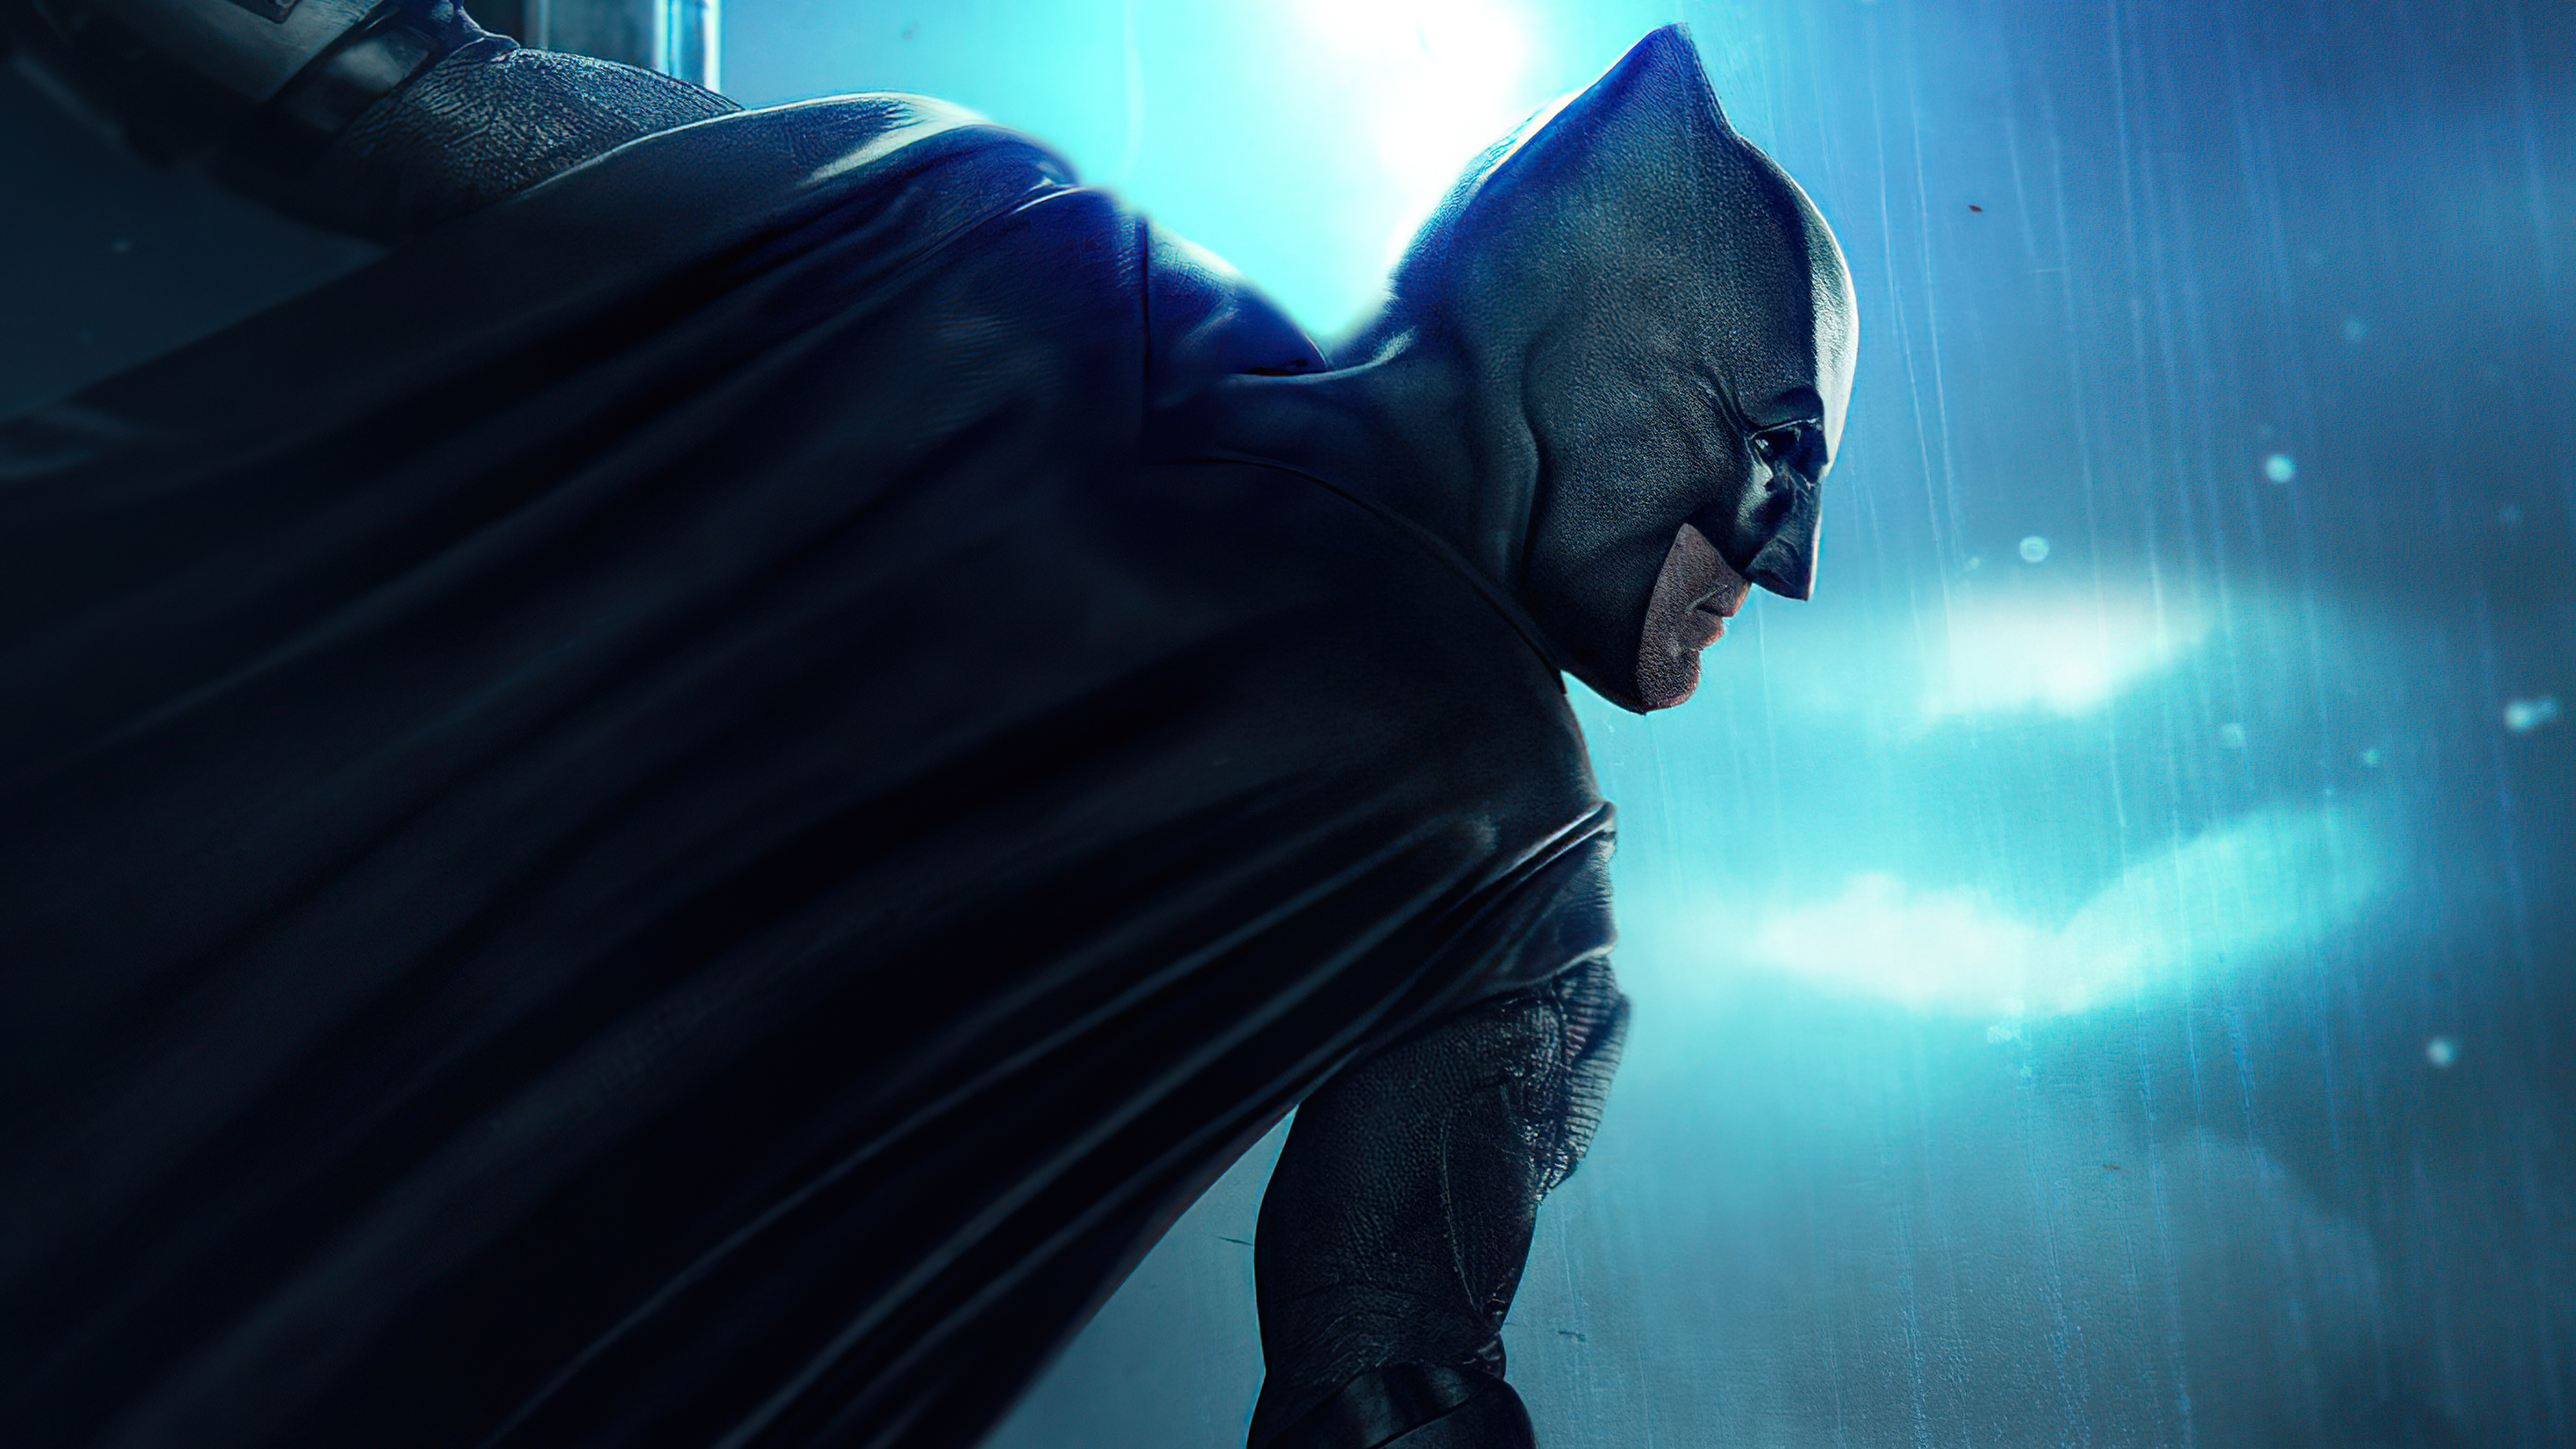 synder cut the batman 4k 1616957339 - Synder Cut The Batman 4k - Synder Cut The Batman 4k wallpapers